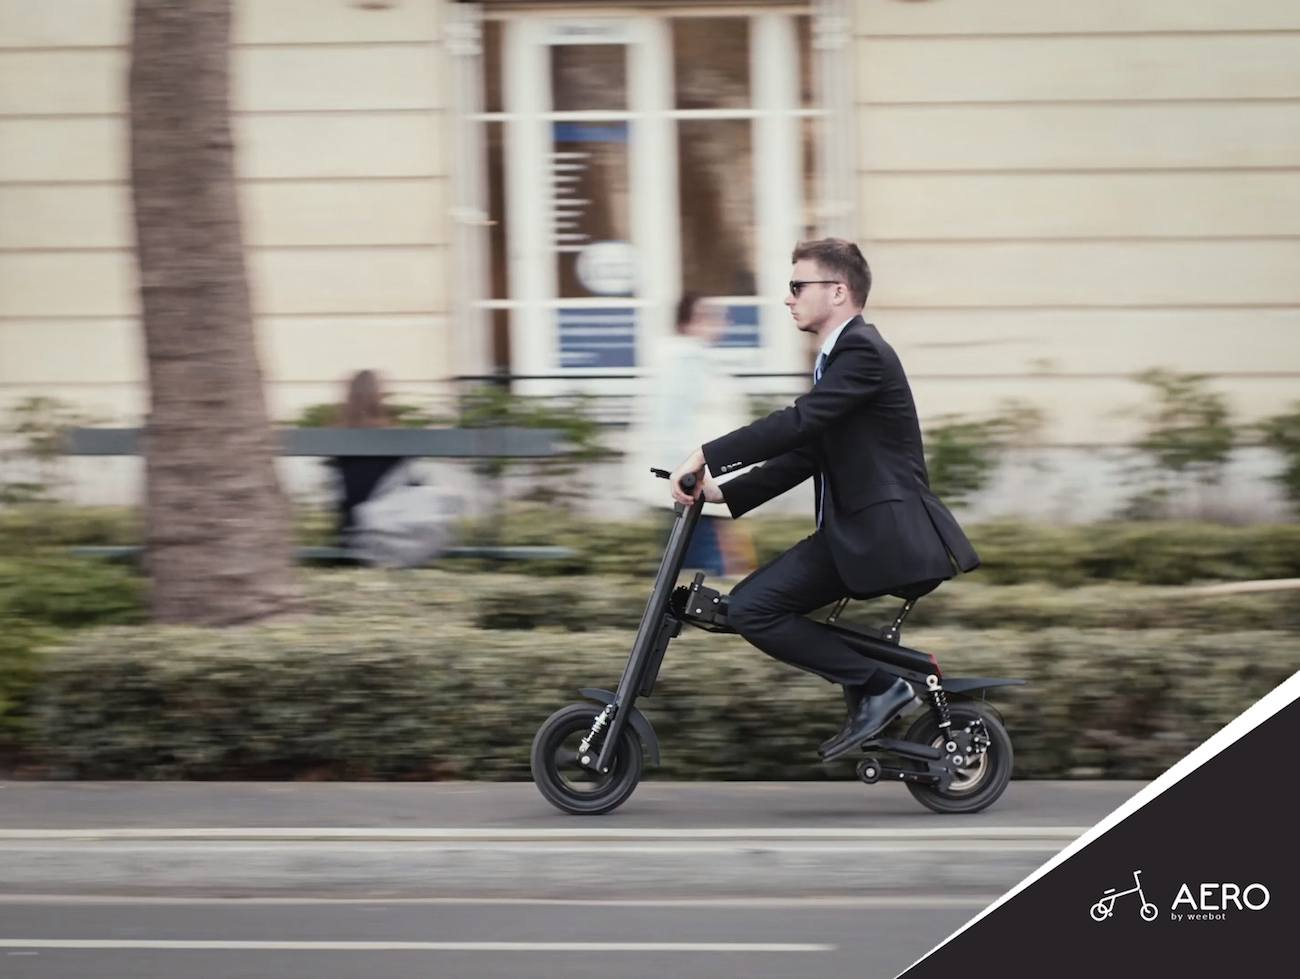 aero-foldable-smart-e-bike-big